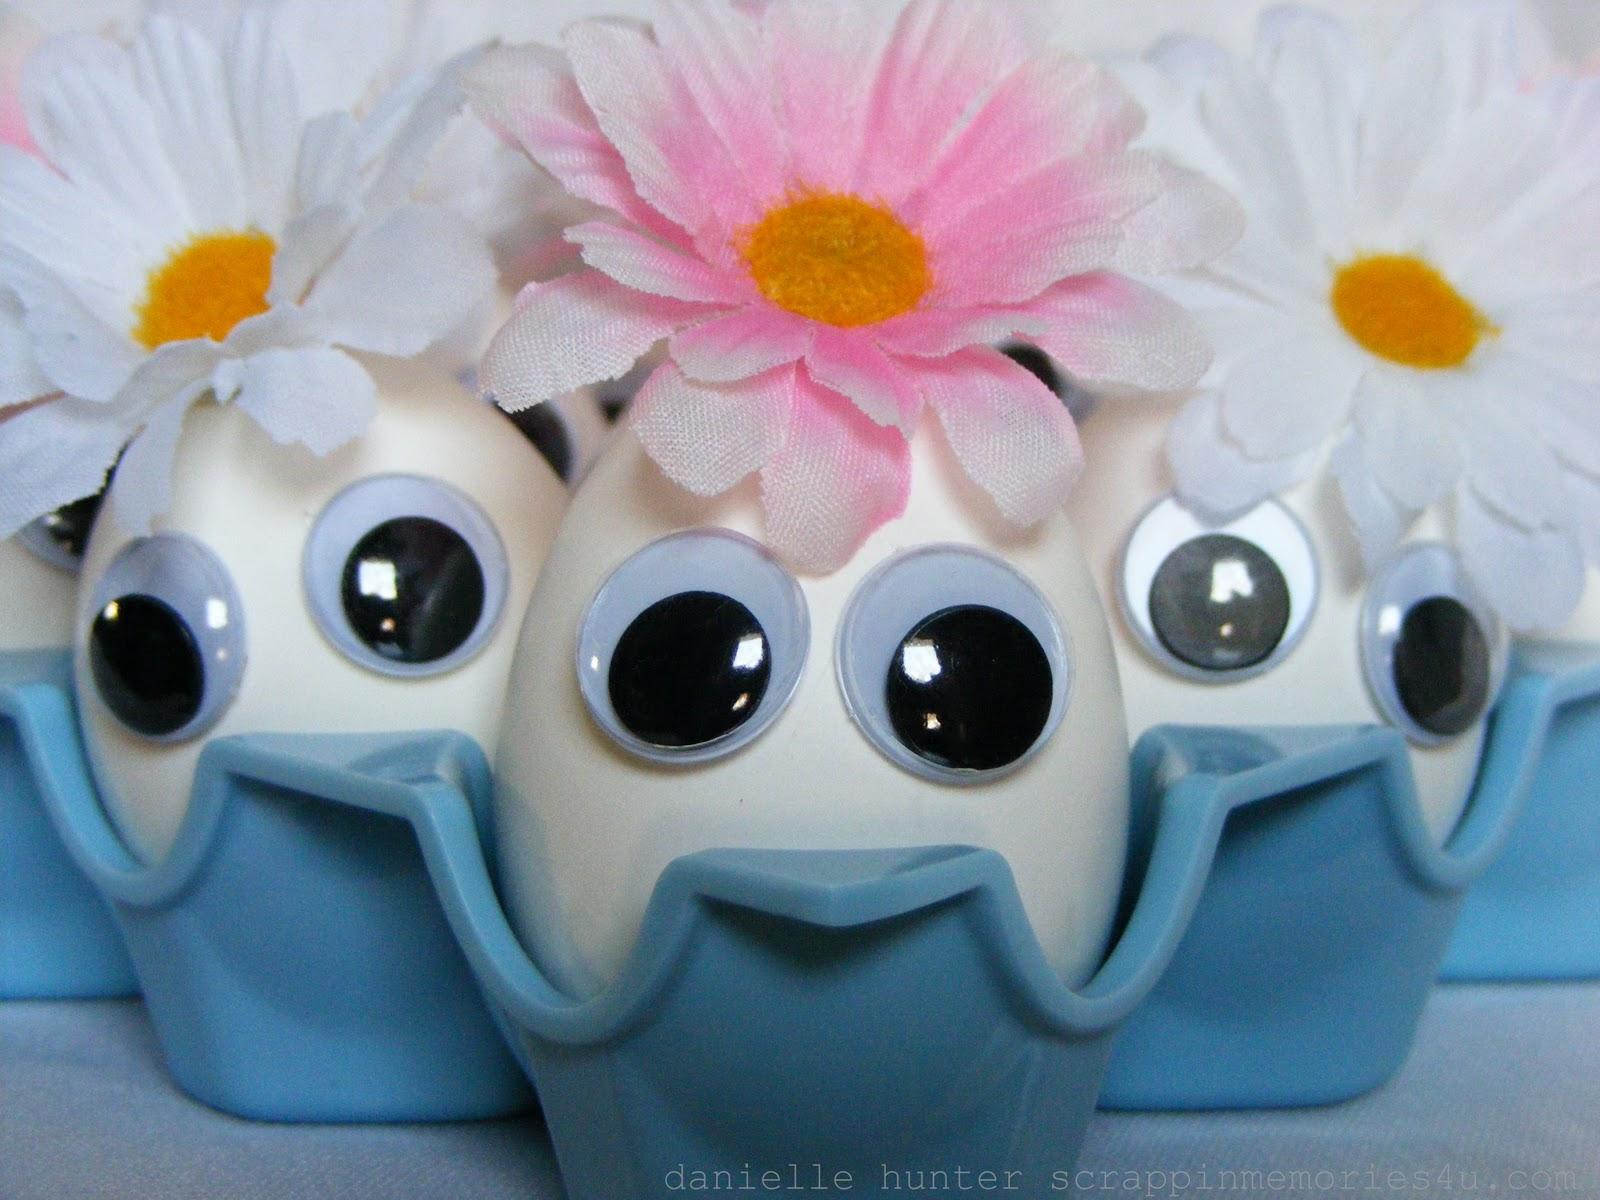 DanielleHunter GlueDots Easter Eggs 2011-1